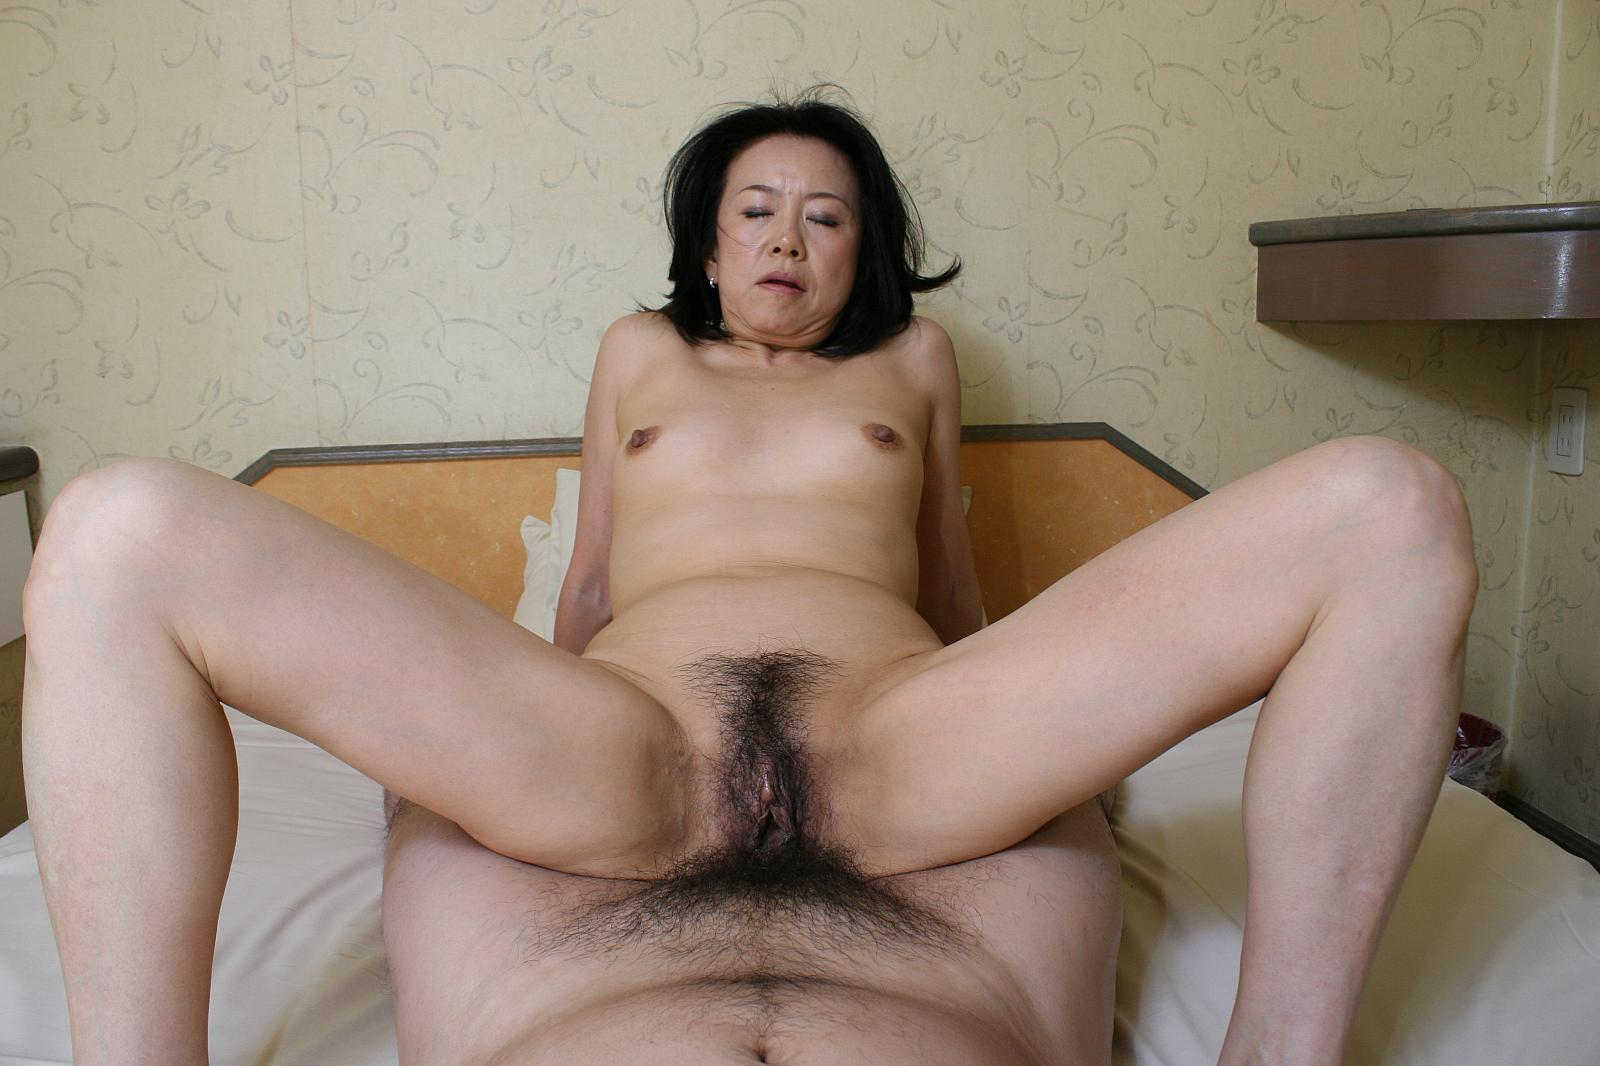 Ayumi iwasa squirts during rough pussy masturbation adventure